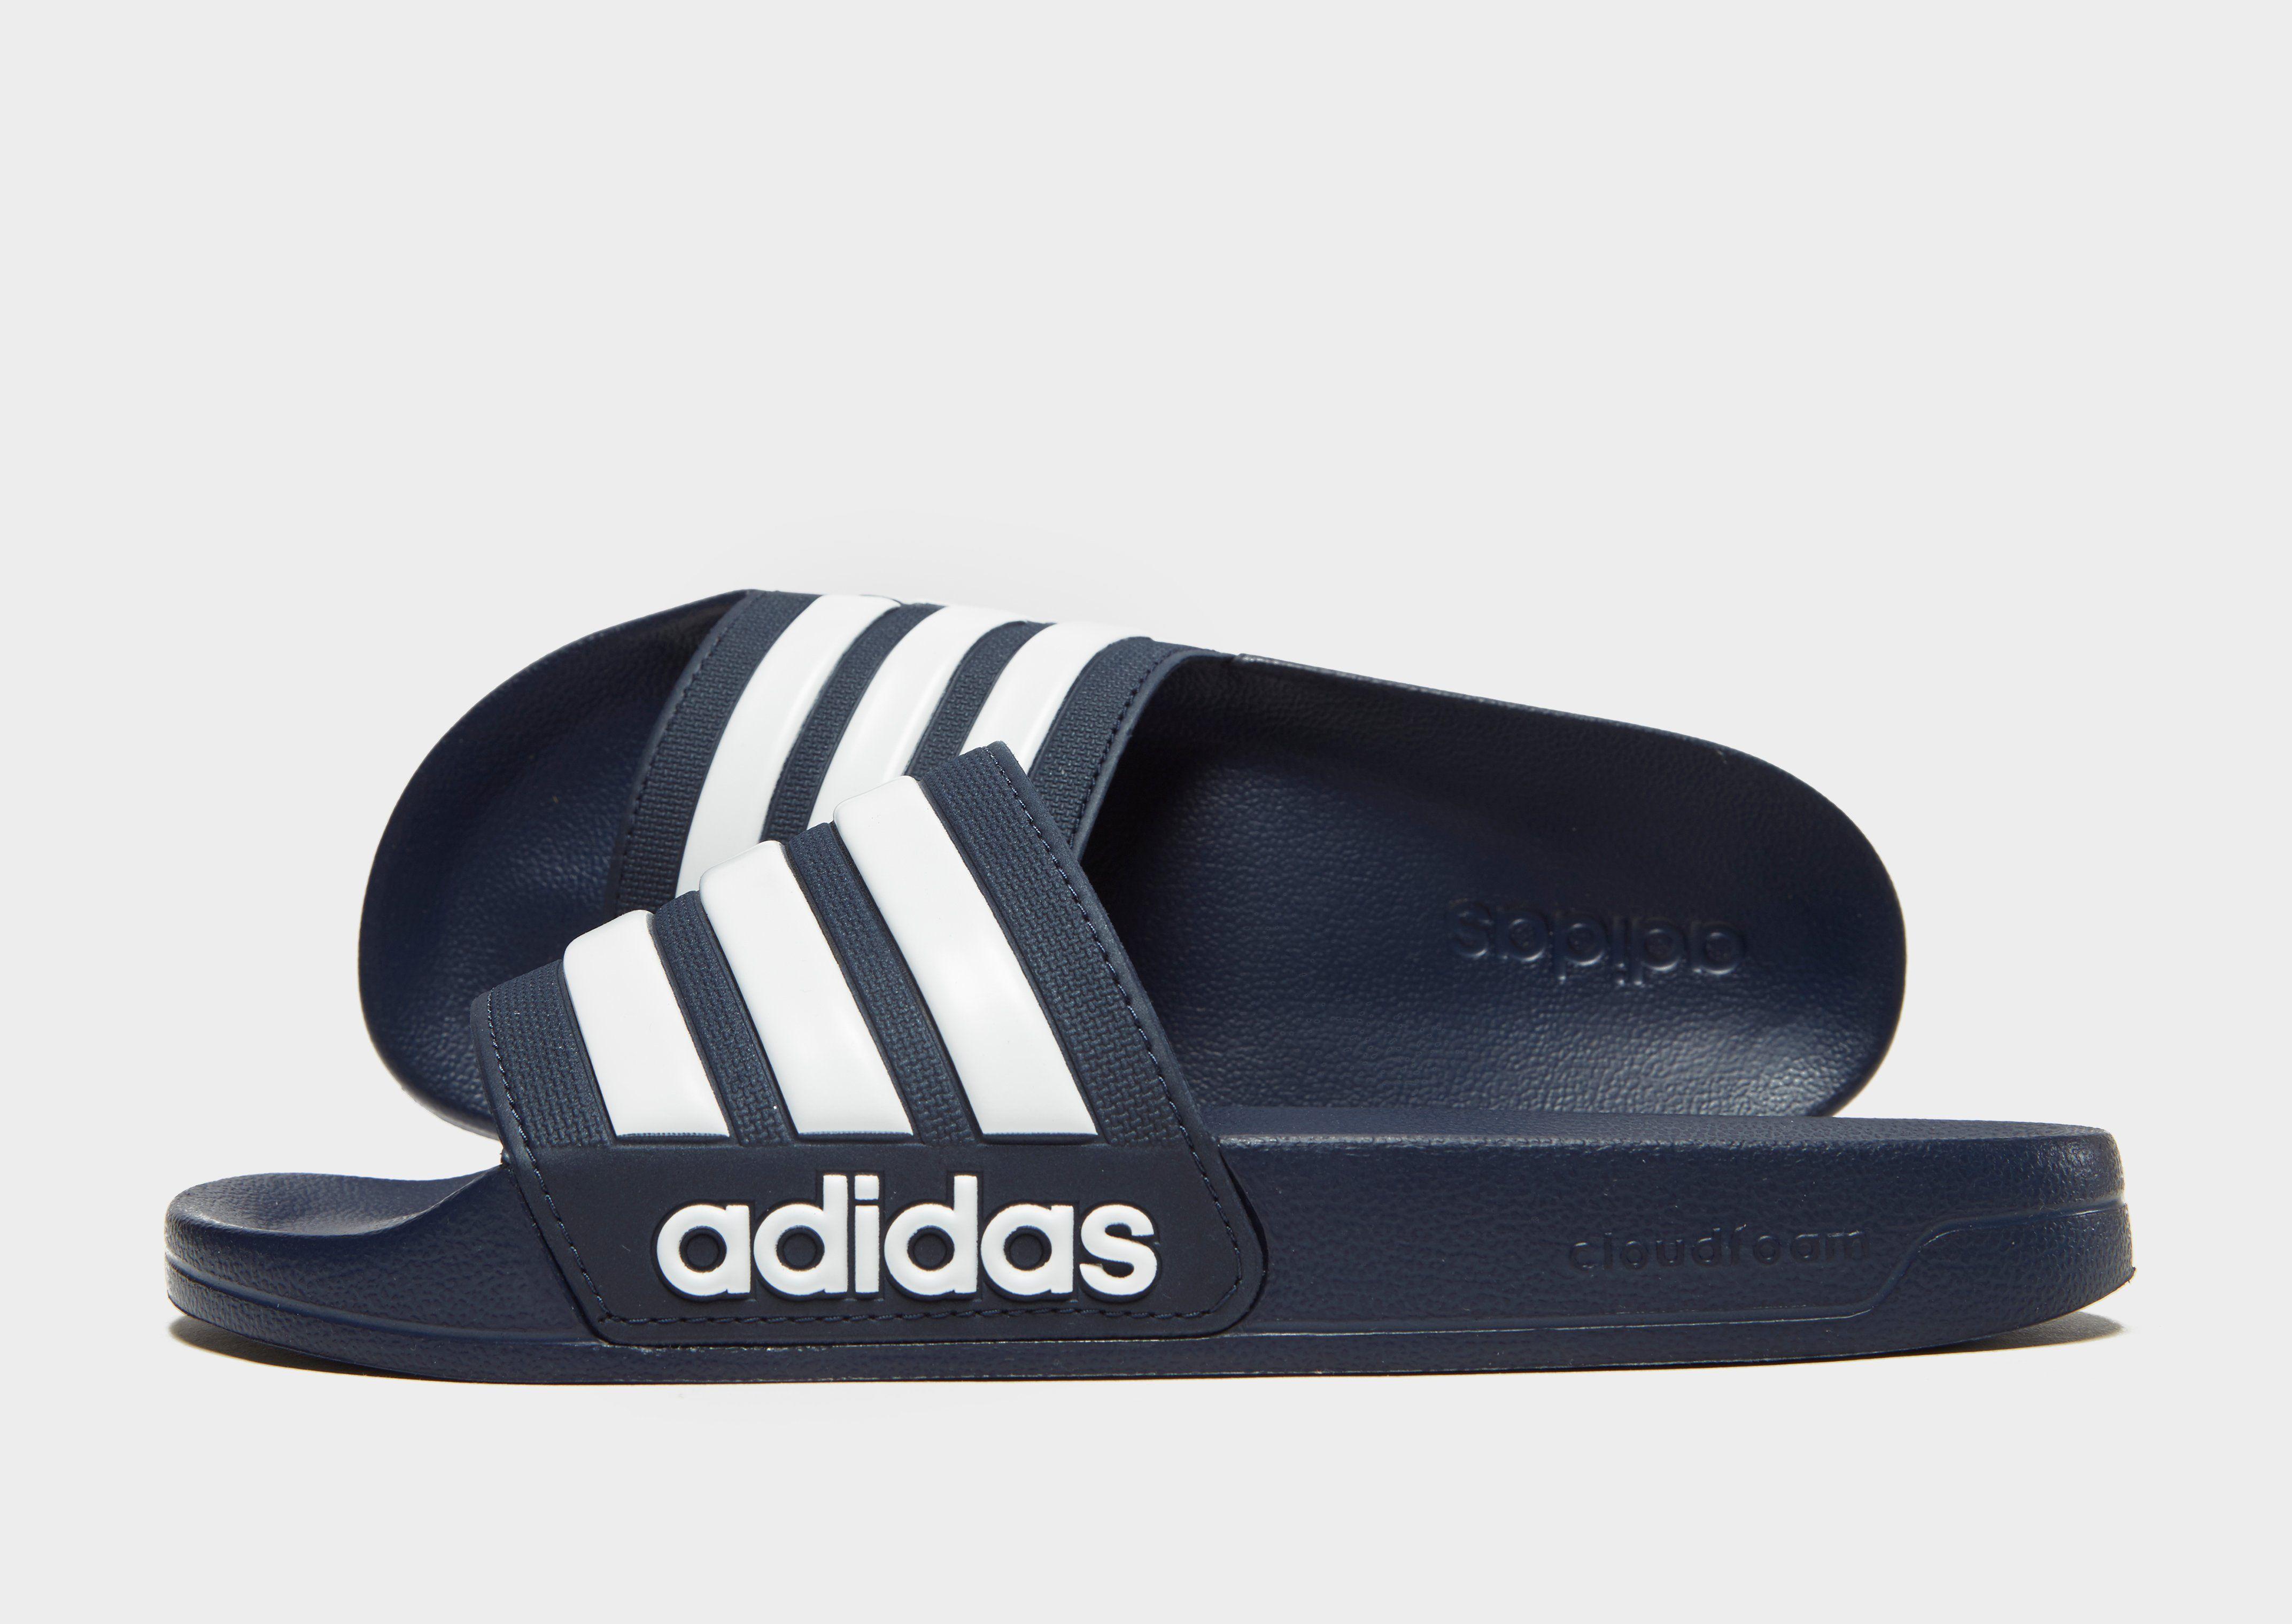 cheaper 8e775 39b52 adidas Cloudfoam Adilette Slides  JD Sports